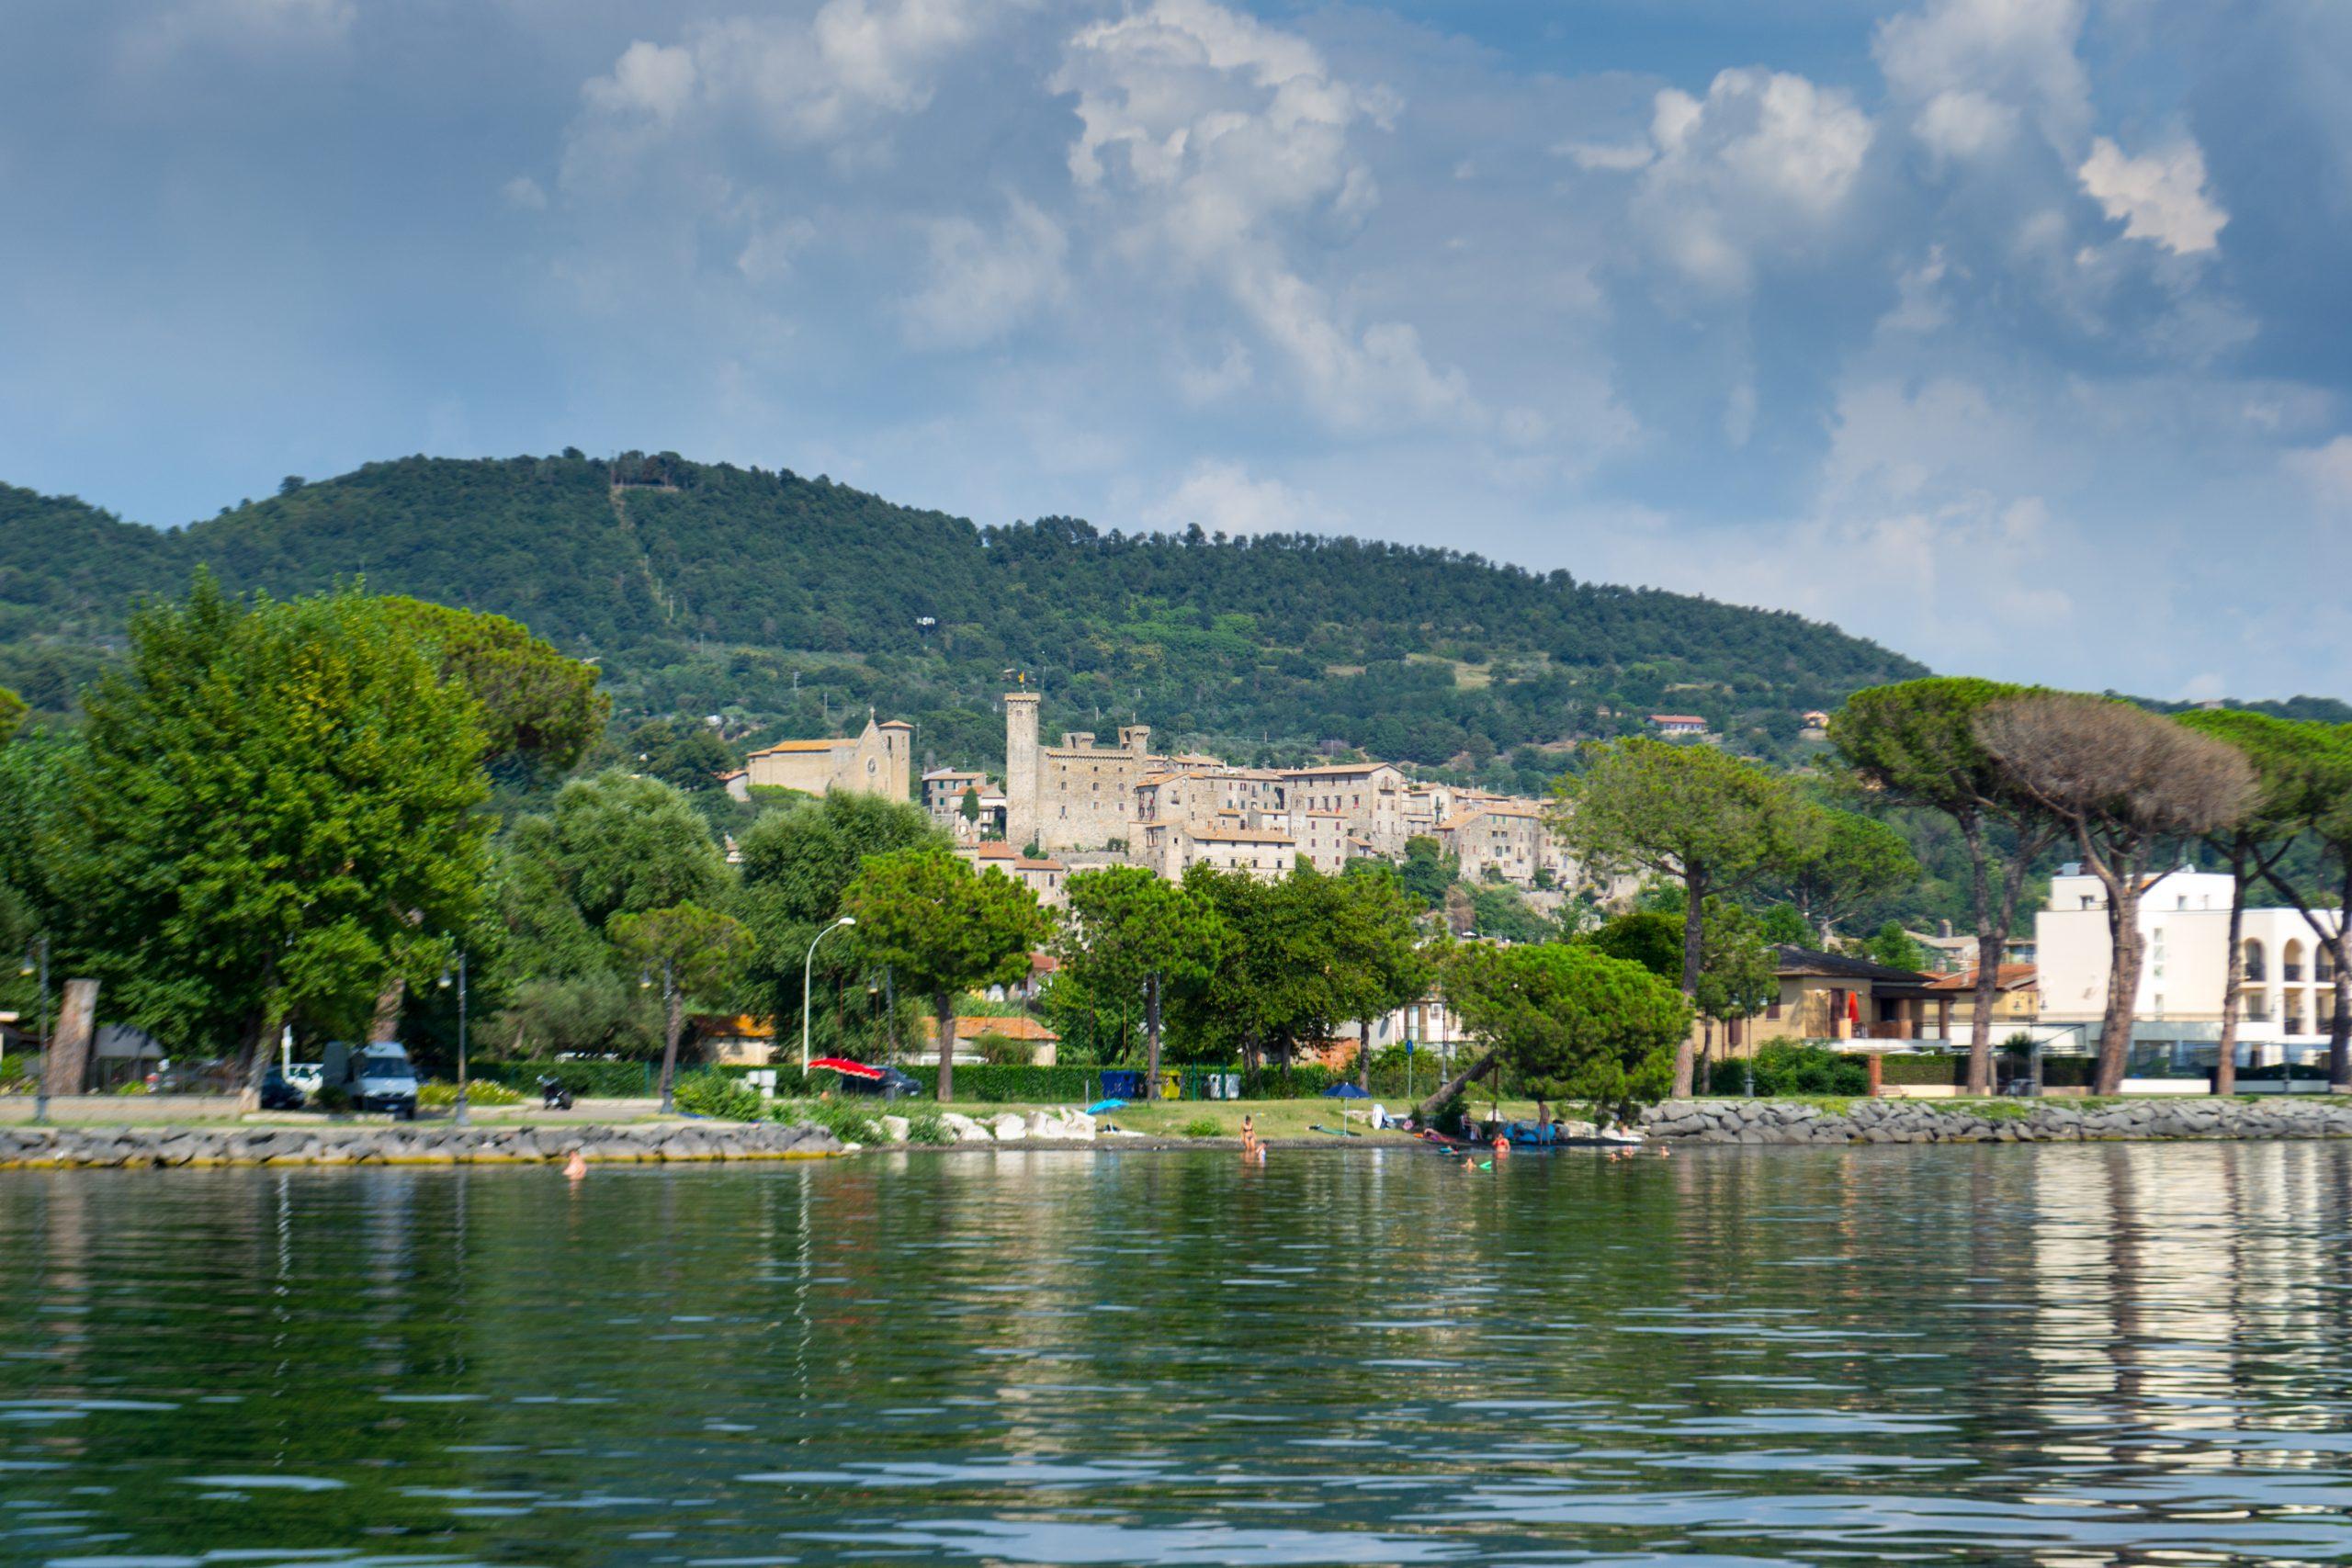 Veduta di Bolsena dal lago di Bolsena